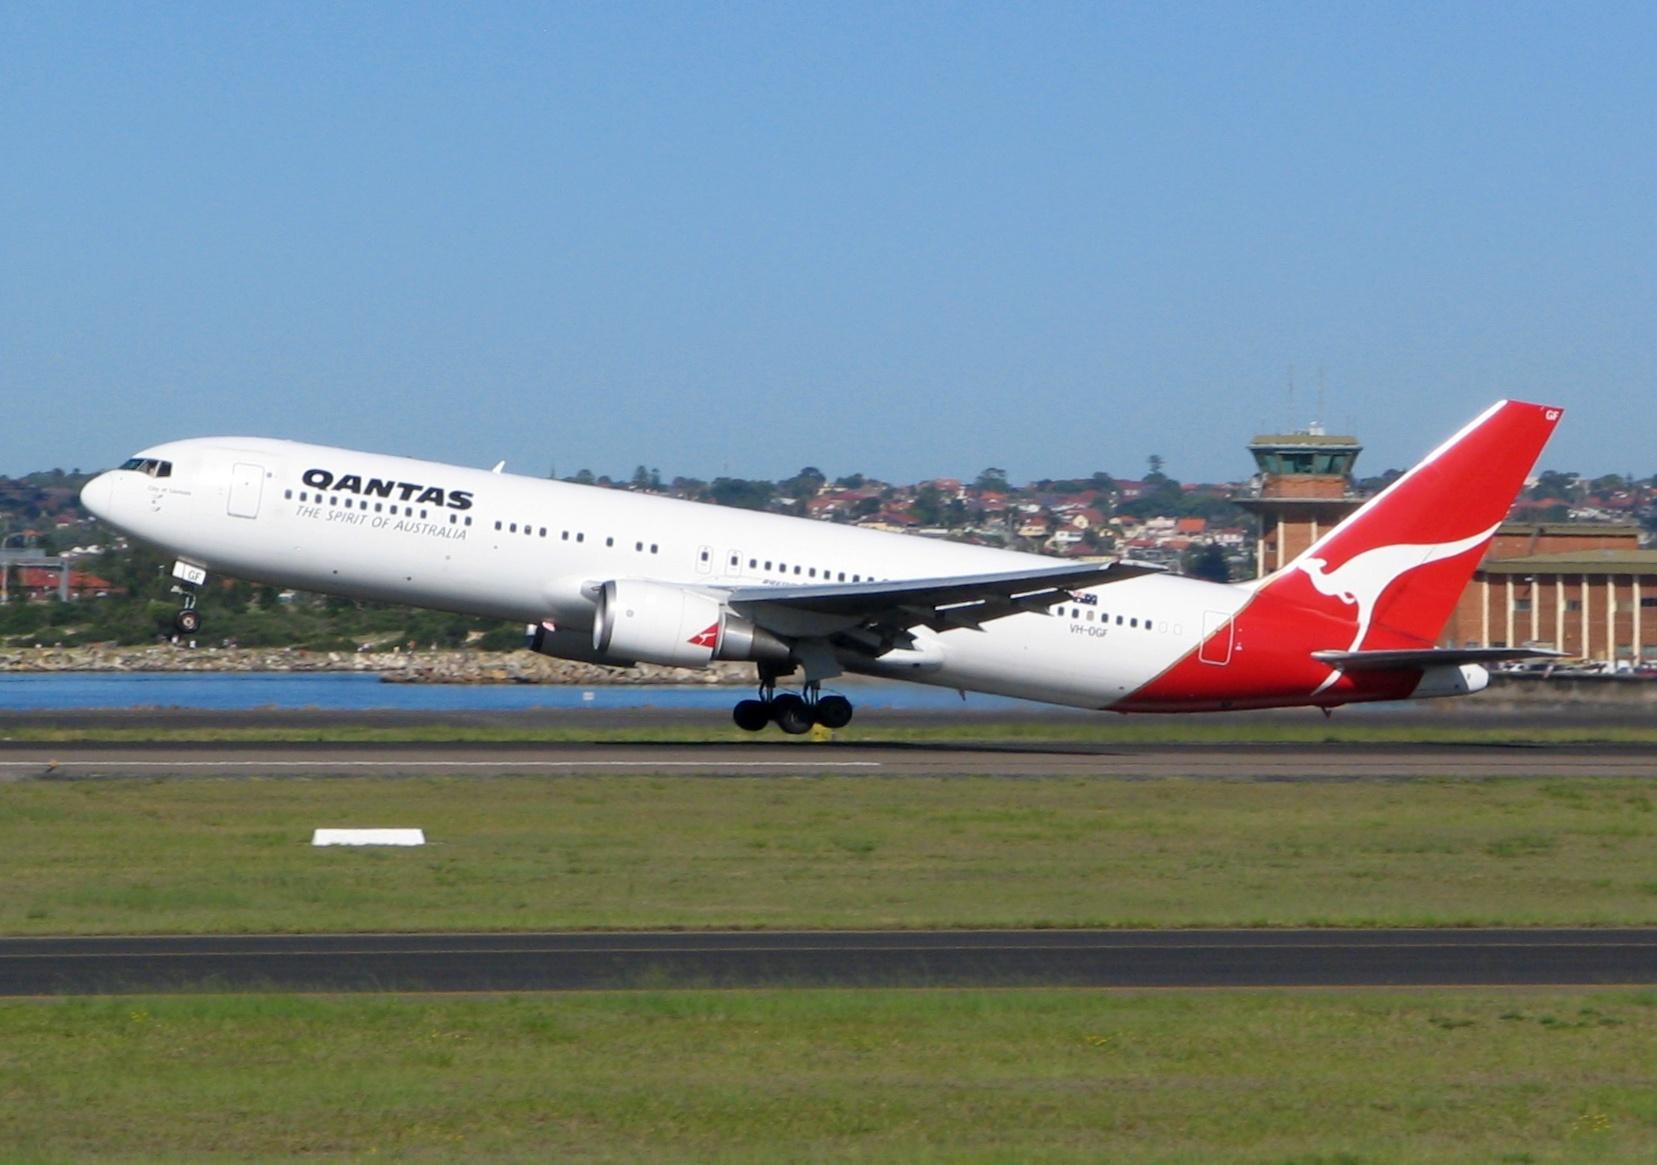 Hire Car Brisbane Airport Qantas